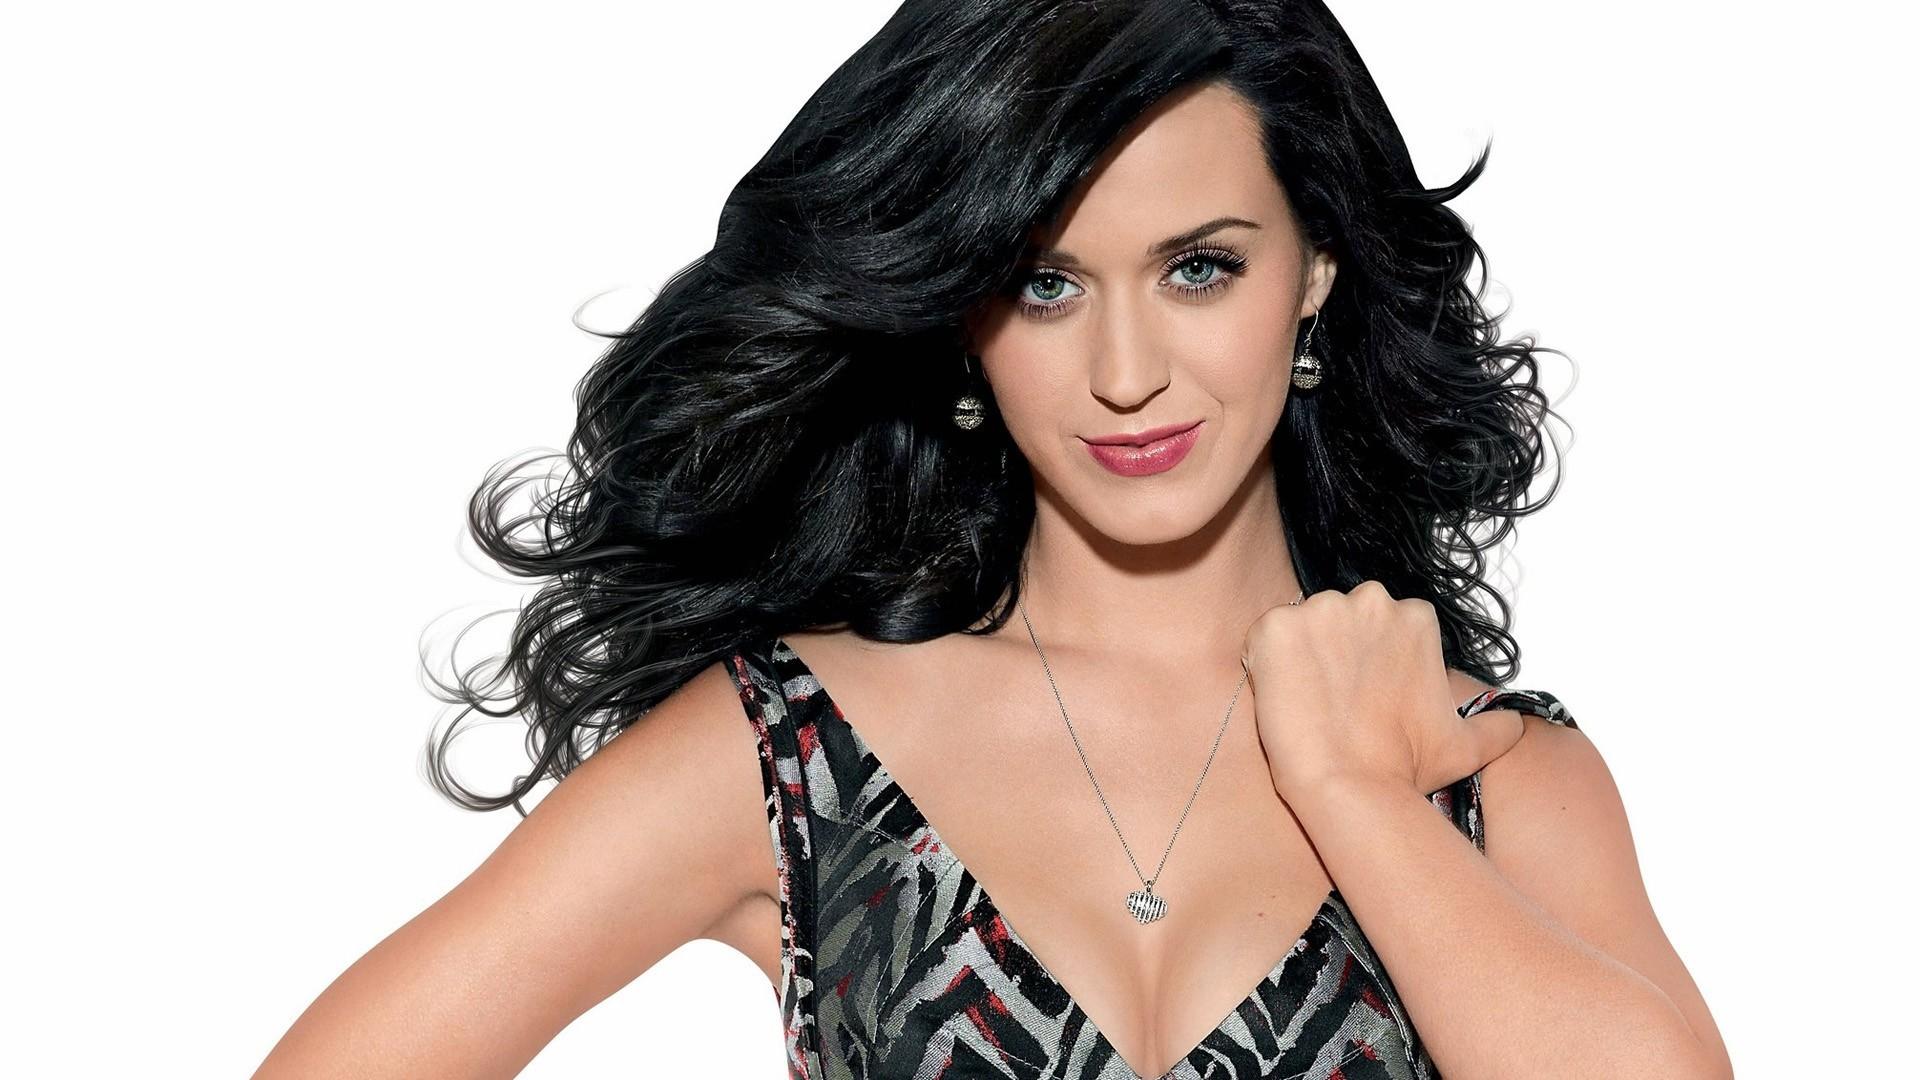 Katy Perry alcanza récord en Twitter; llega a 100 millones de seguidores | El Imparcial de Oaxaca